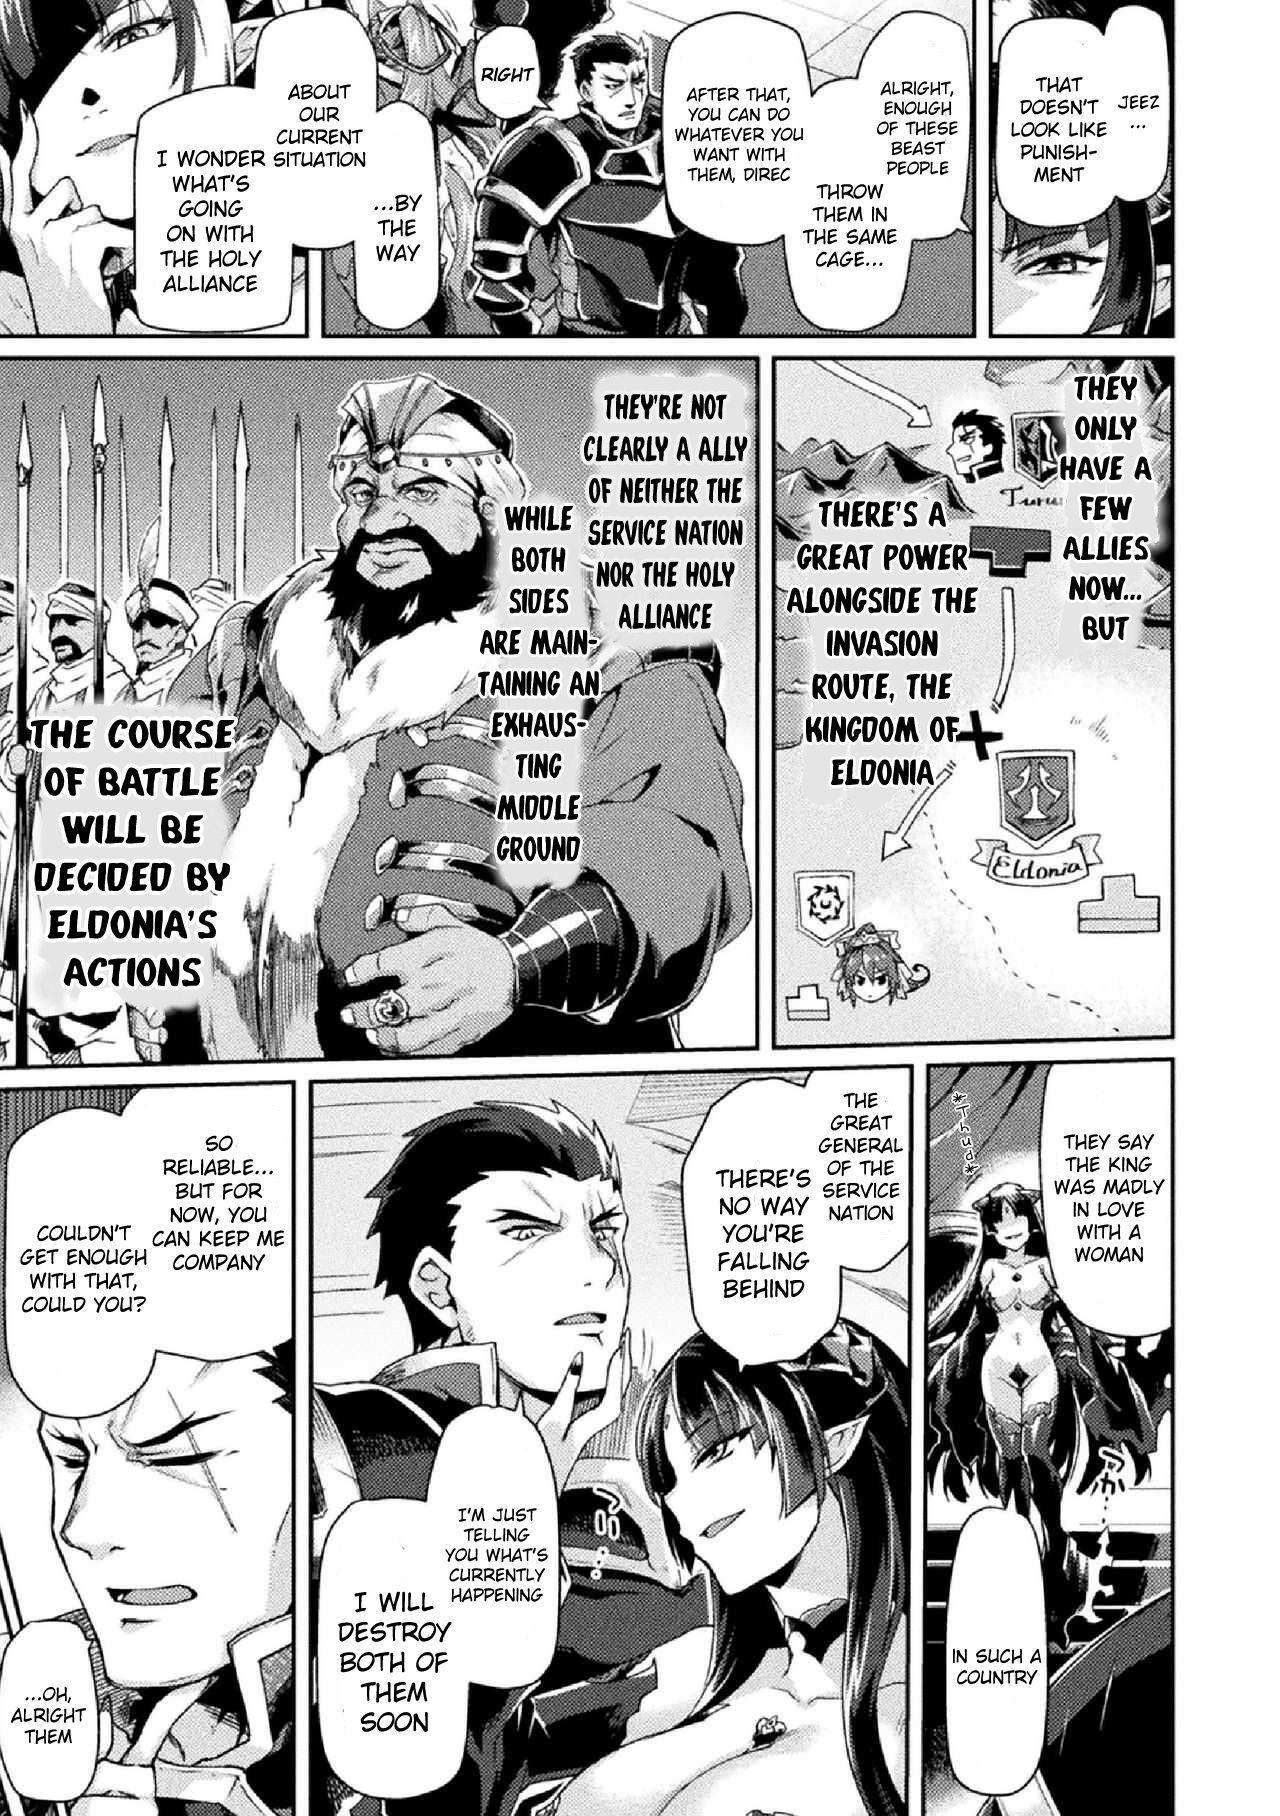 [Tsukitokage] Kuroinu II ~Inyoku ni Somaru Haitoku no Miyako, Futatabi~ THE COMIC Chapter 5 (Kukkoro Heroines Vol. 5) [Digital] [English] [Decensored] (Klub Kemoner) 18